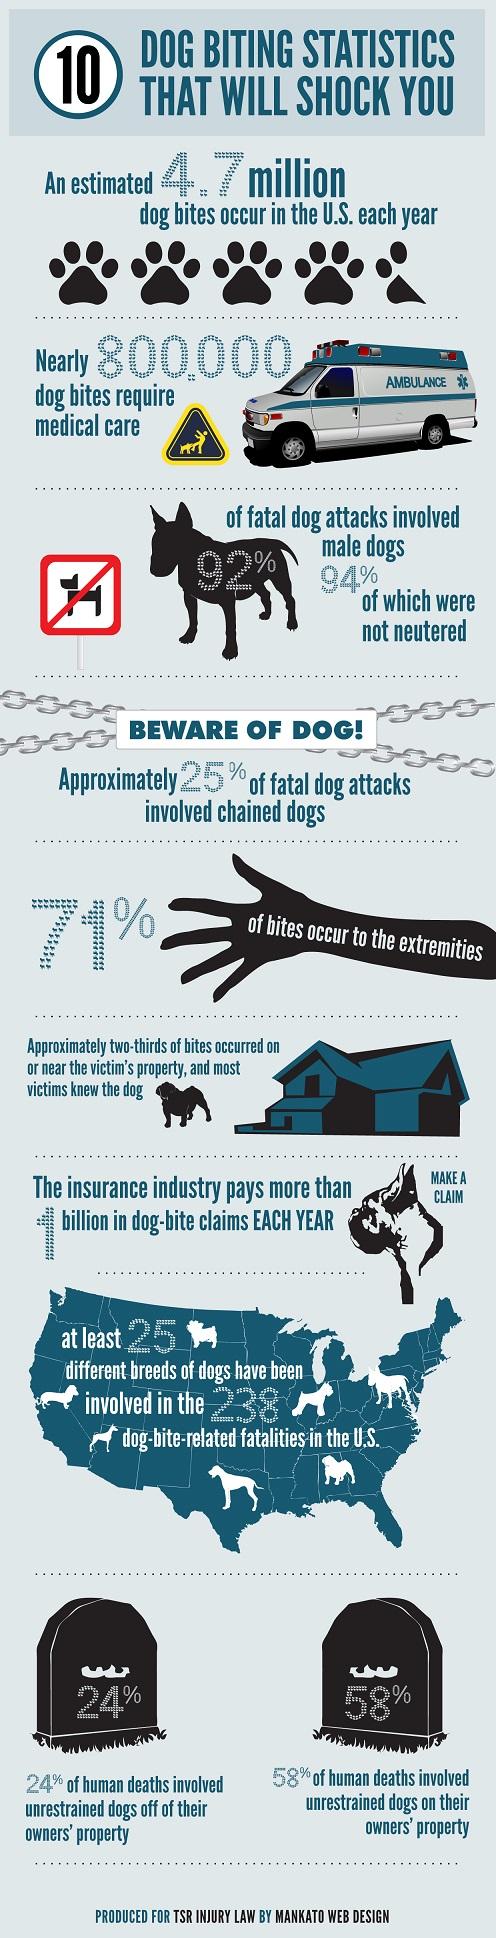 10 Dog Biting Statistics That Will Shock You